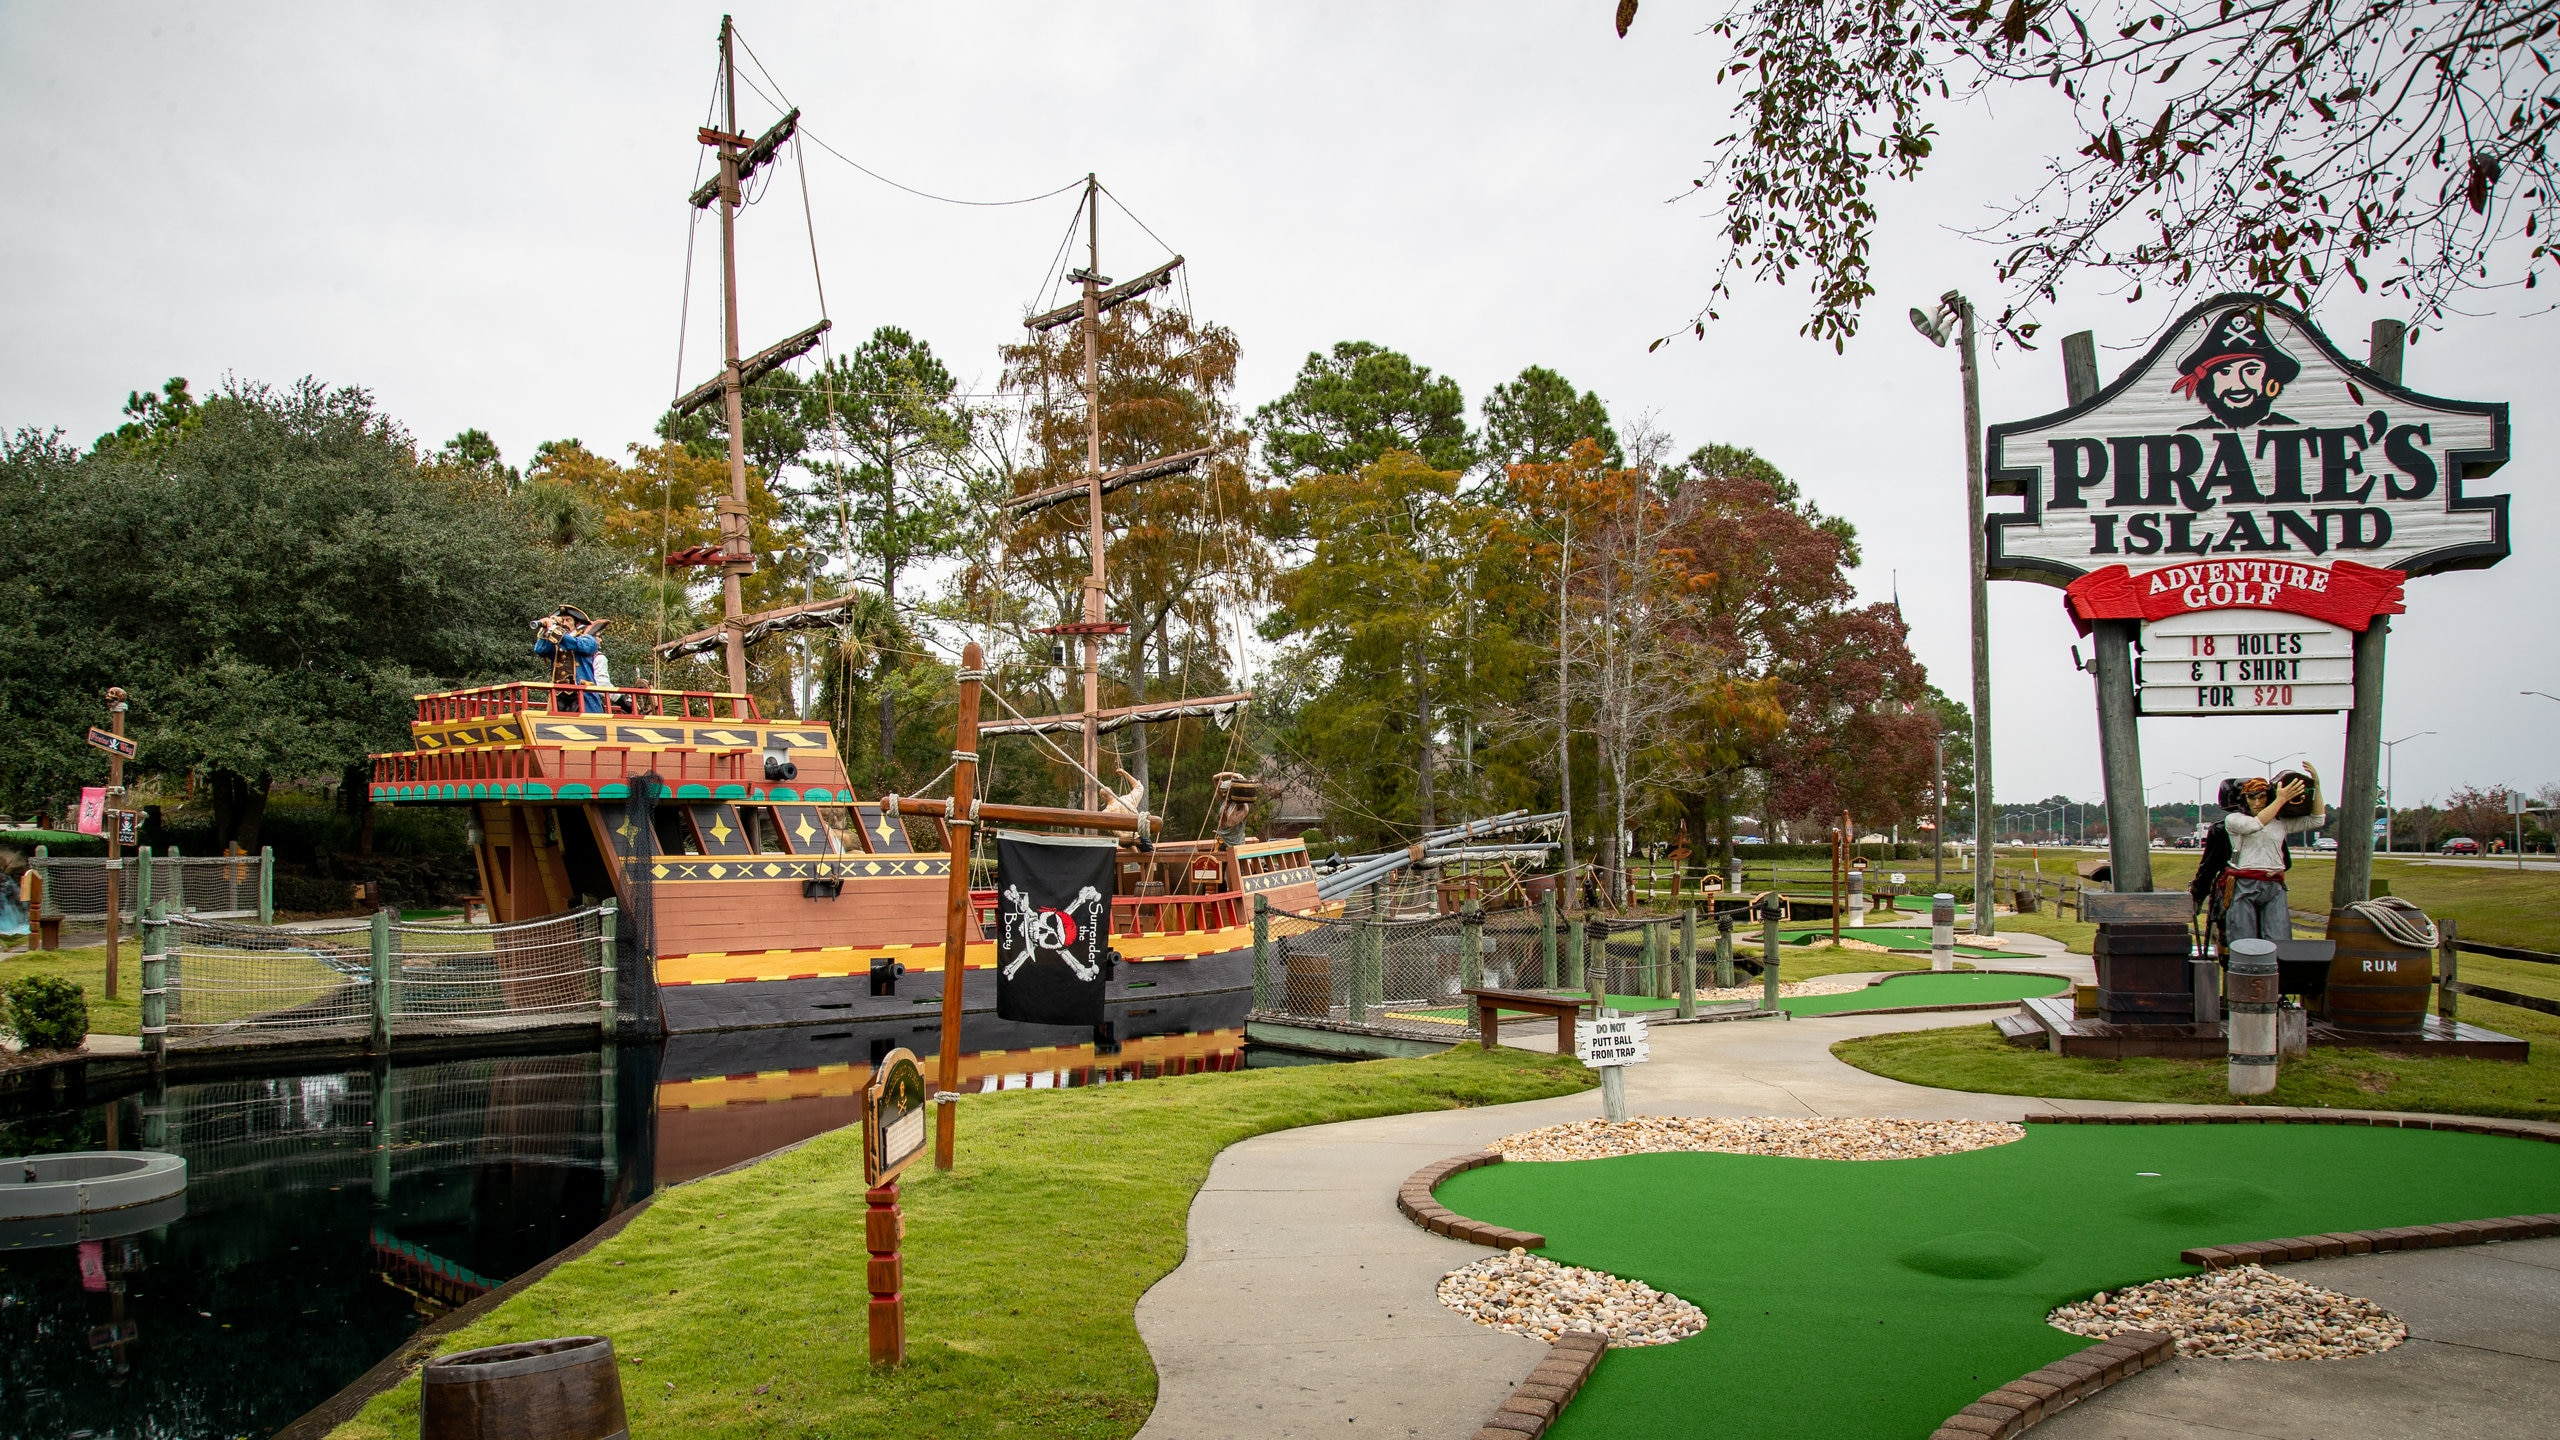 Pirates Island Adventure Golf (Minigolf), Gulf Shores, Alabama, USA